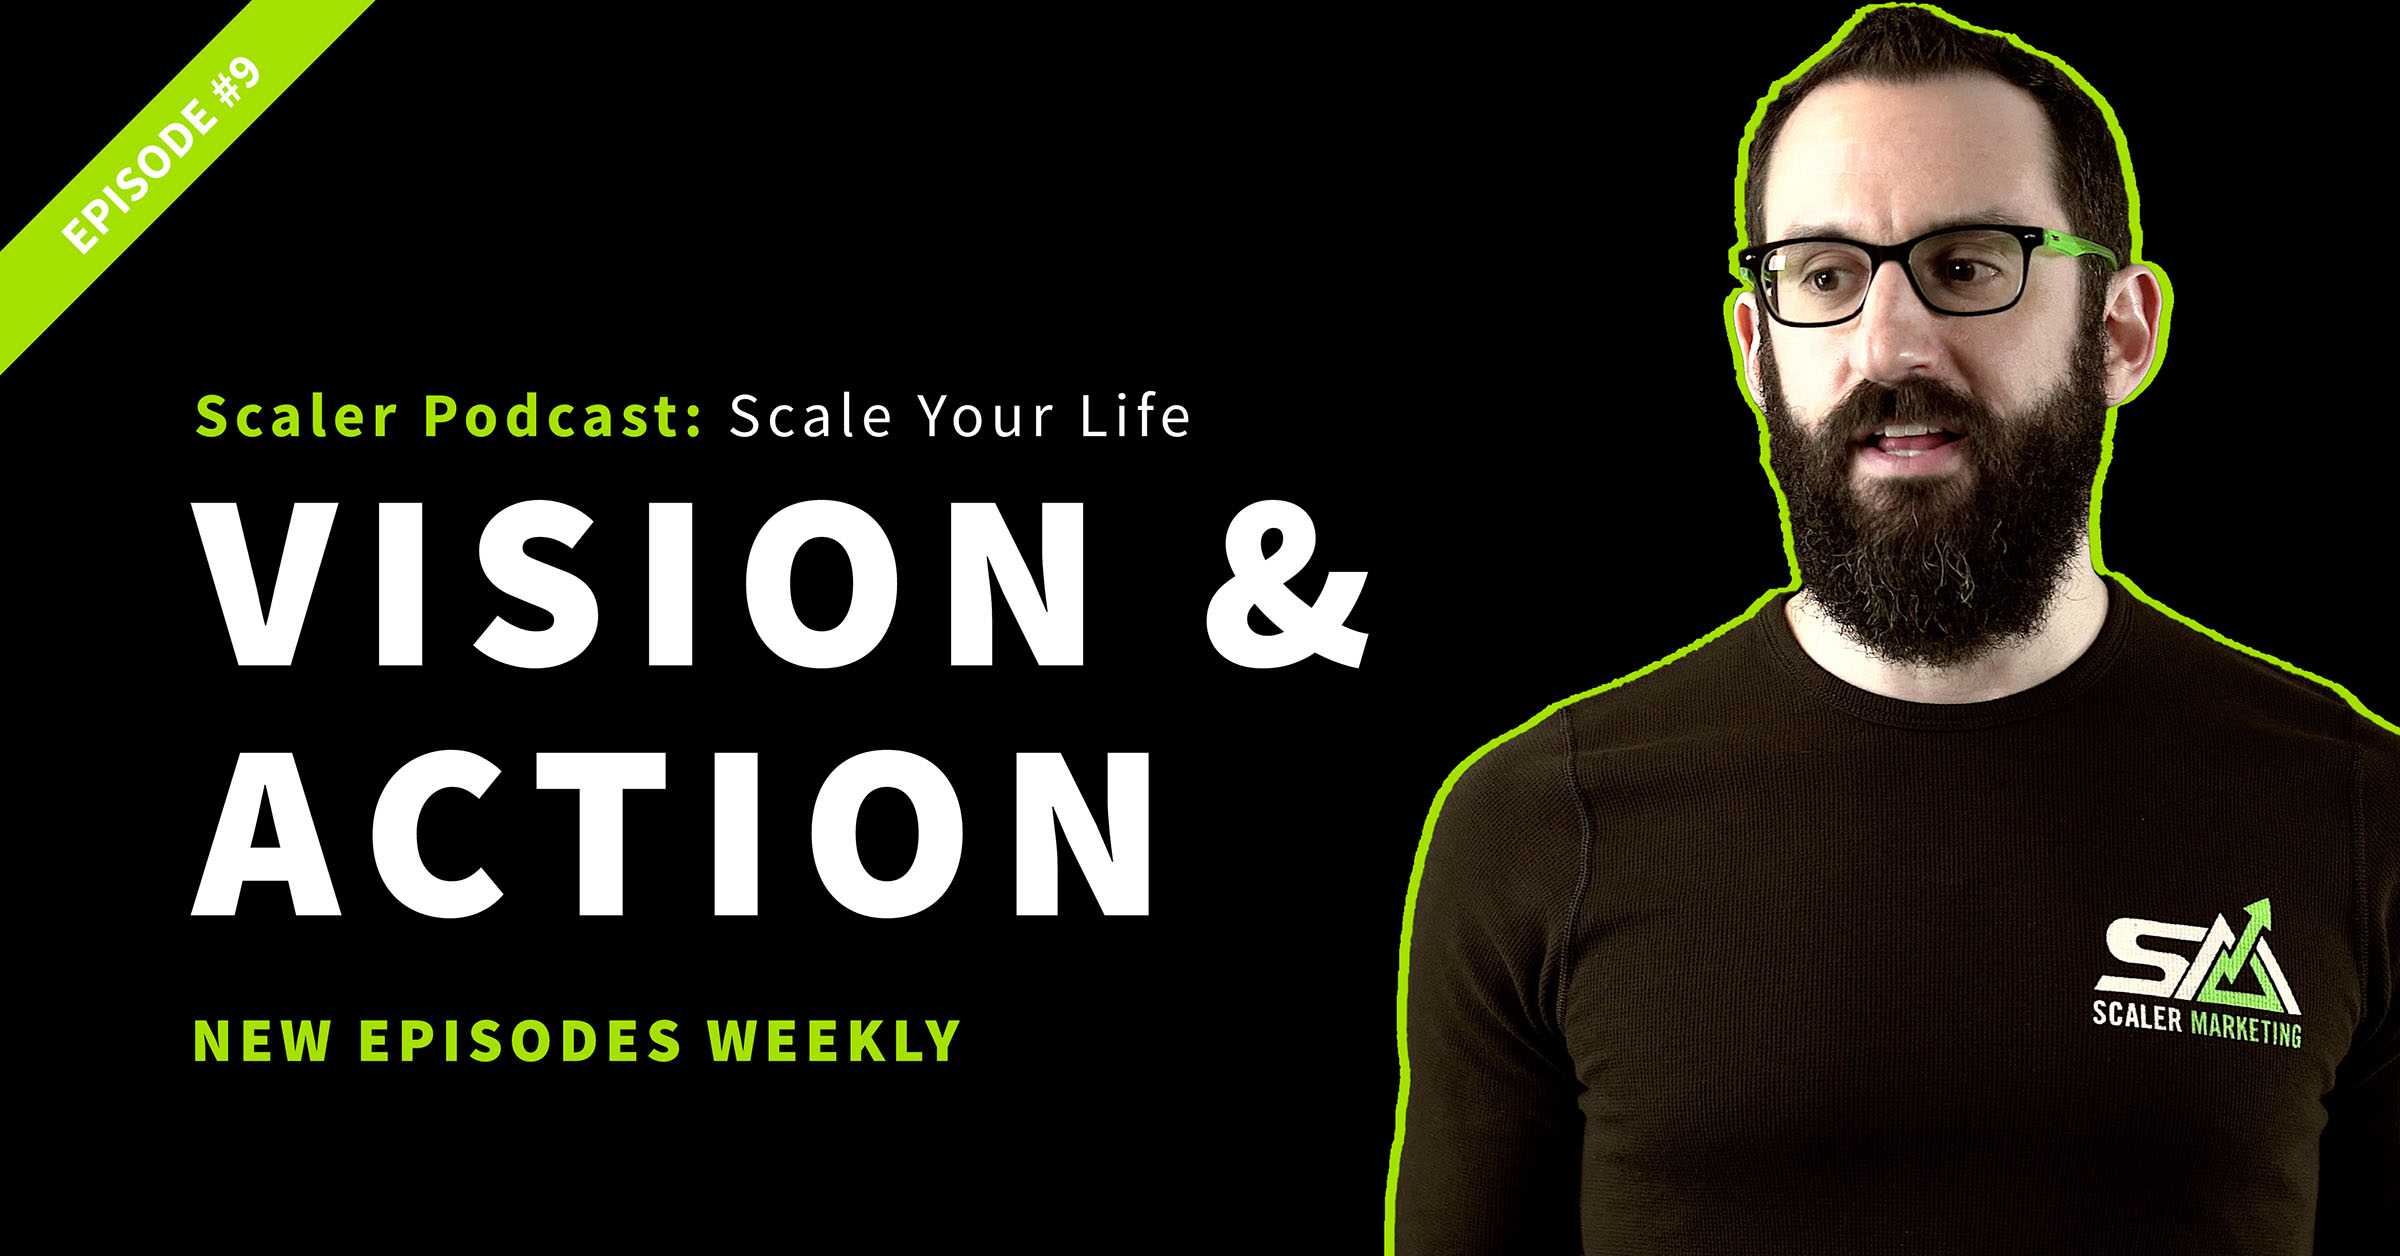 Episode 9 - Vision & Action